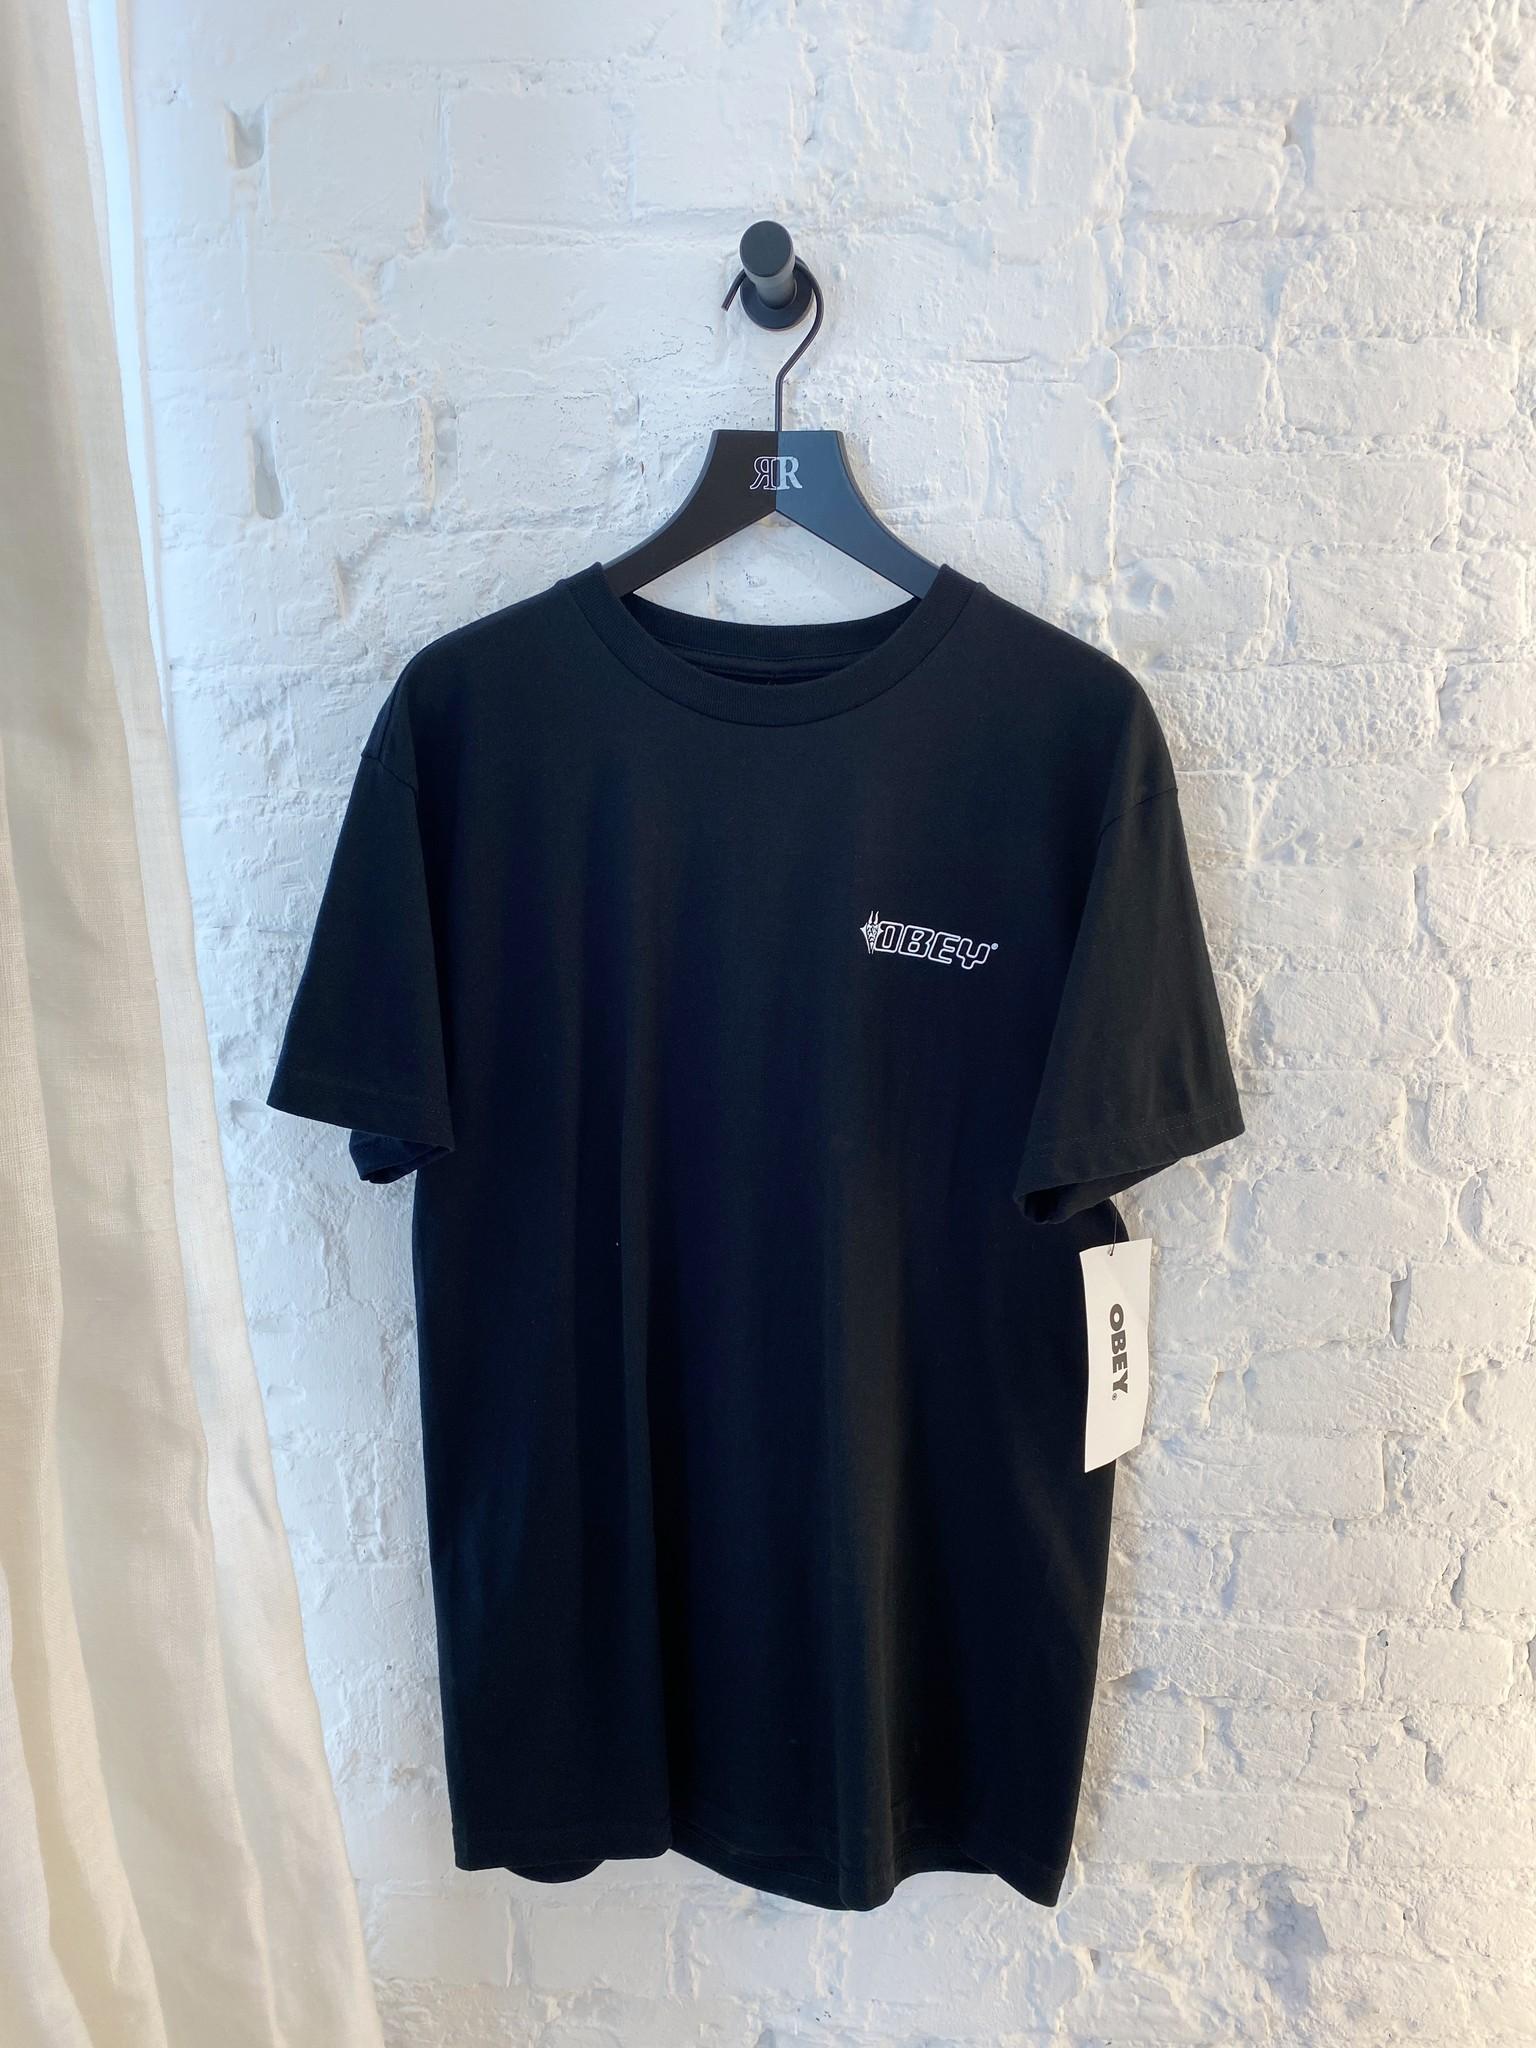 Transport Services T-shirt-1